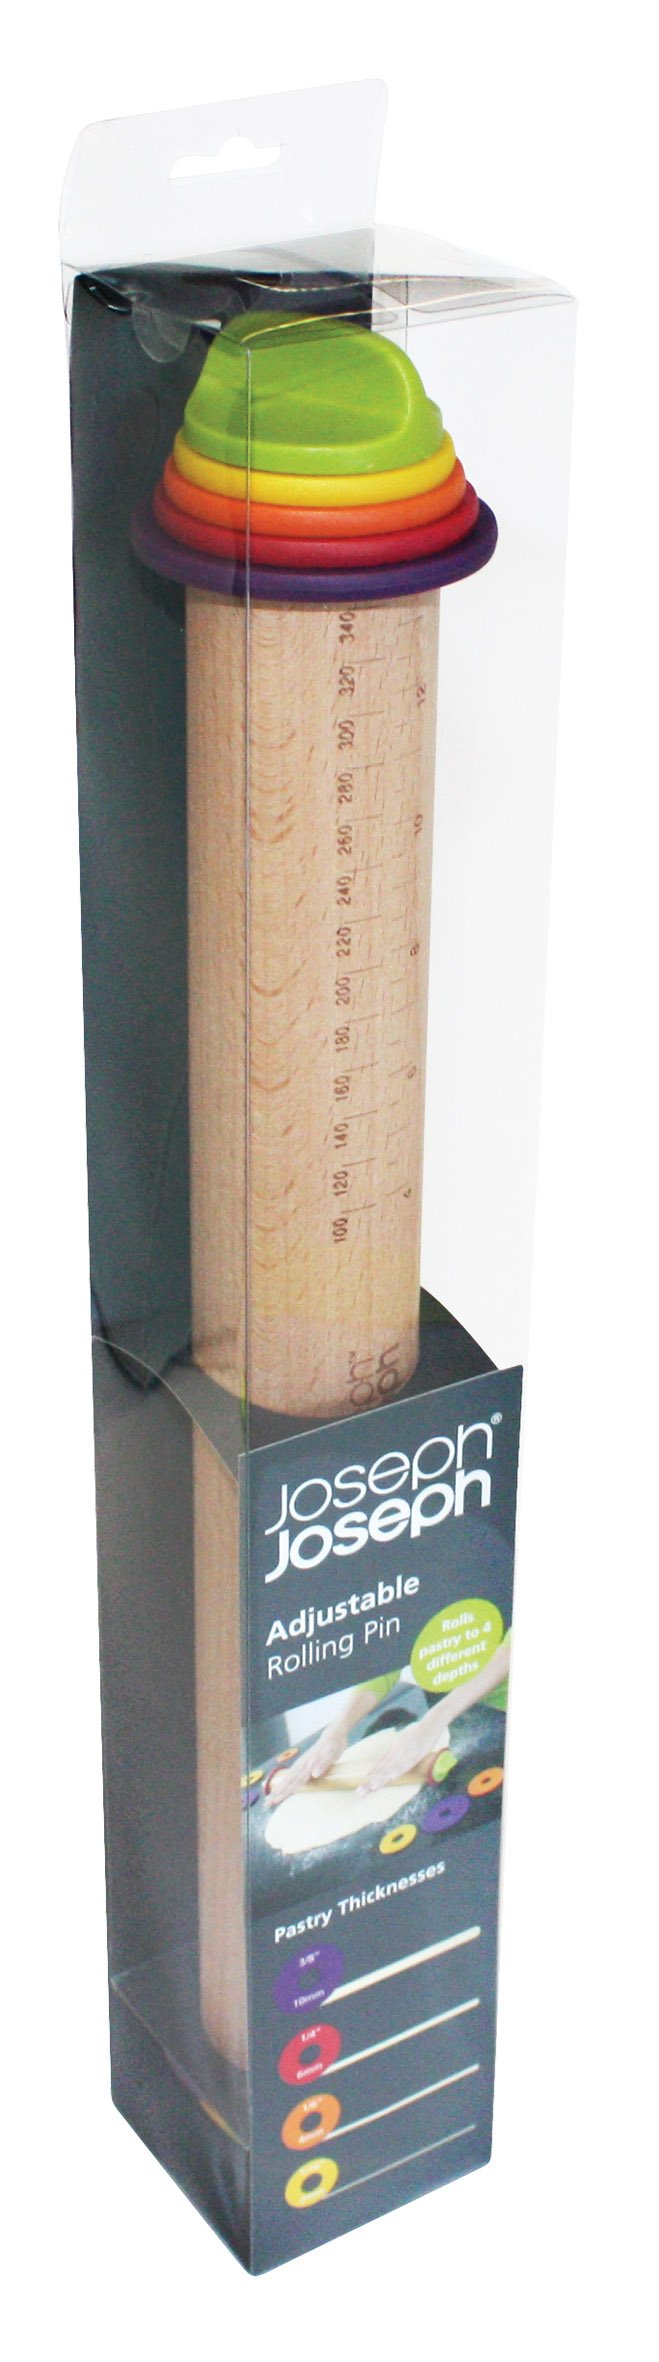 Joseph Joseph 20085 Adjustable Rolling Pin with Removable Rings, Multicolored by Joseph Joseph (Image #3)